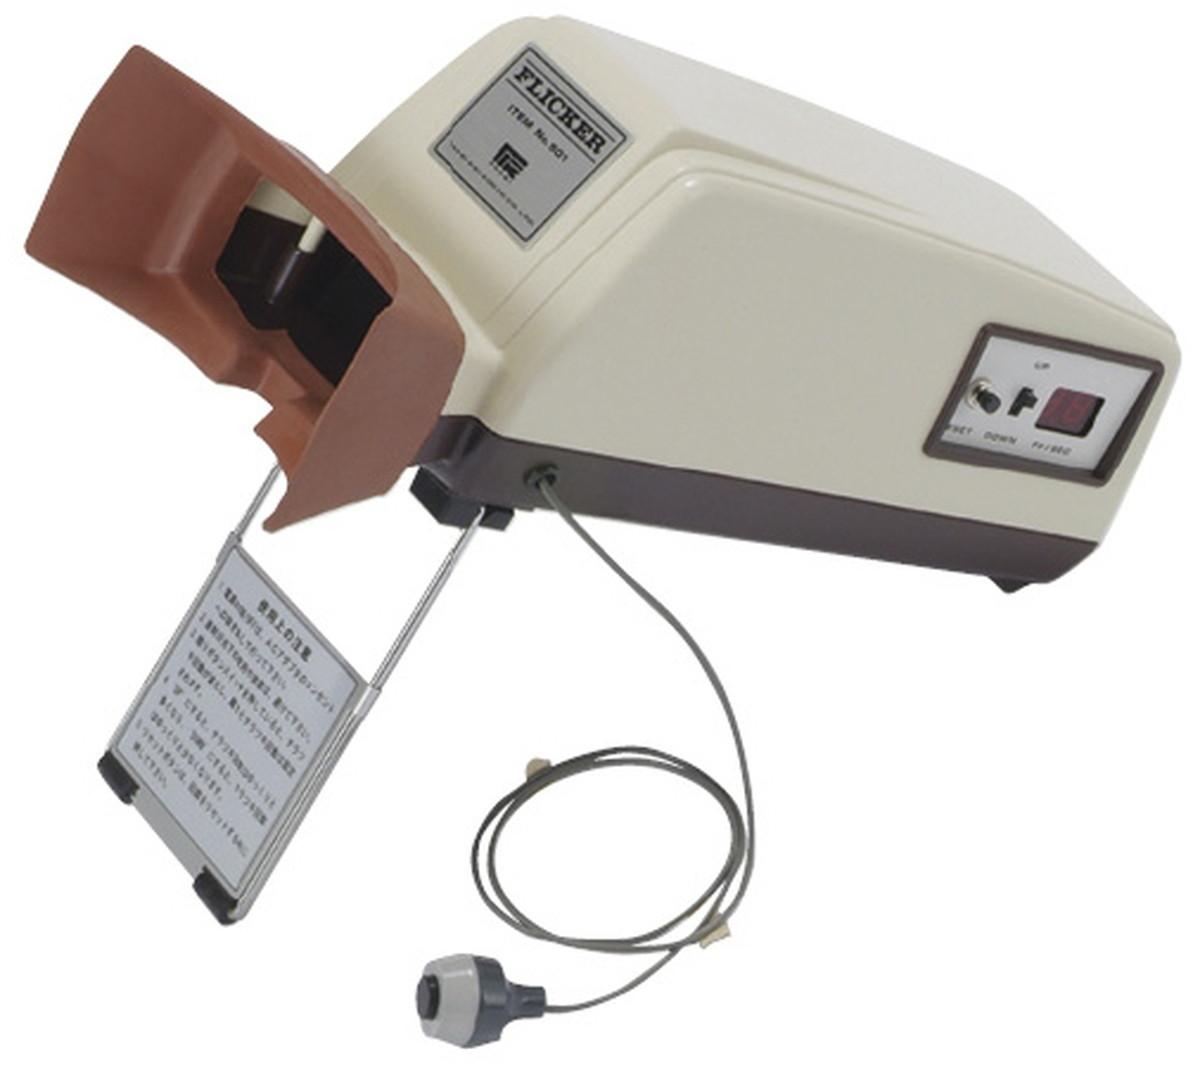 【送料無料】-フリッカー値測定器型(自動型) TKK-501C 品番 my19-2420-00-- 1入り-【MY医科器機】